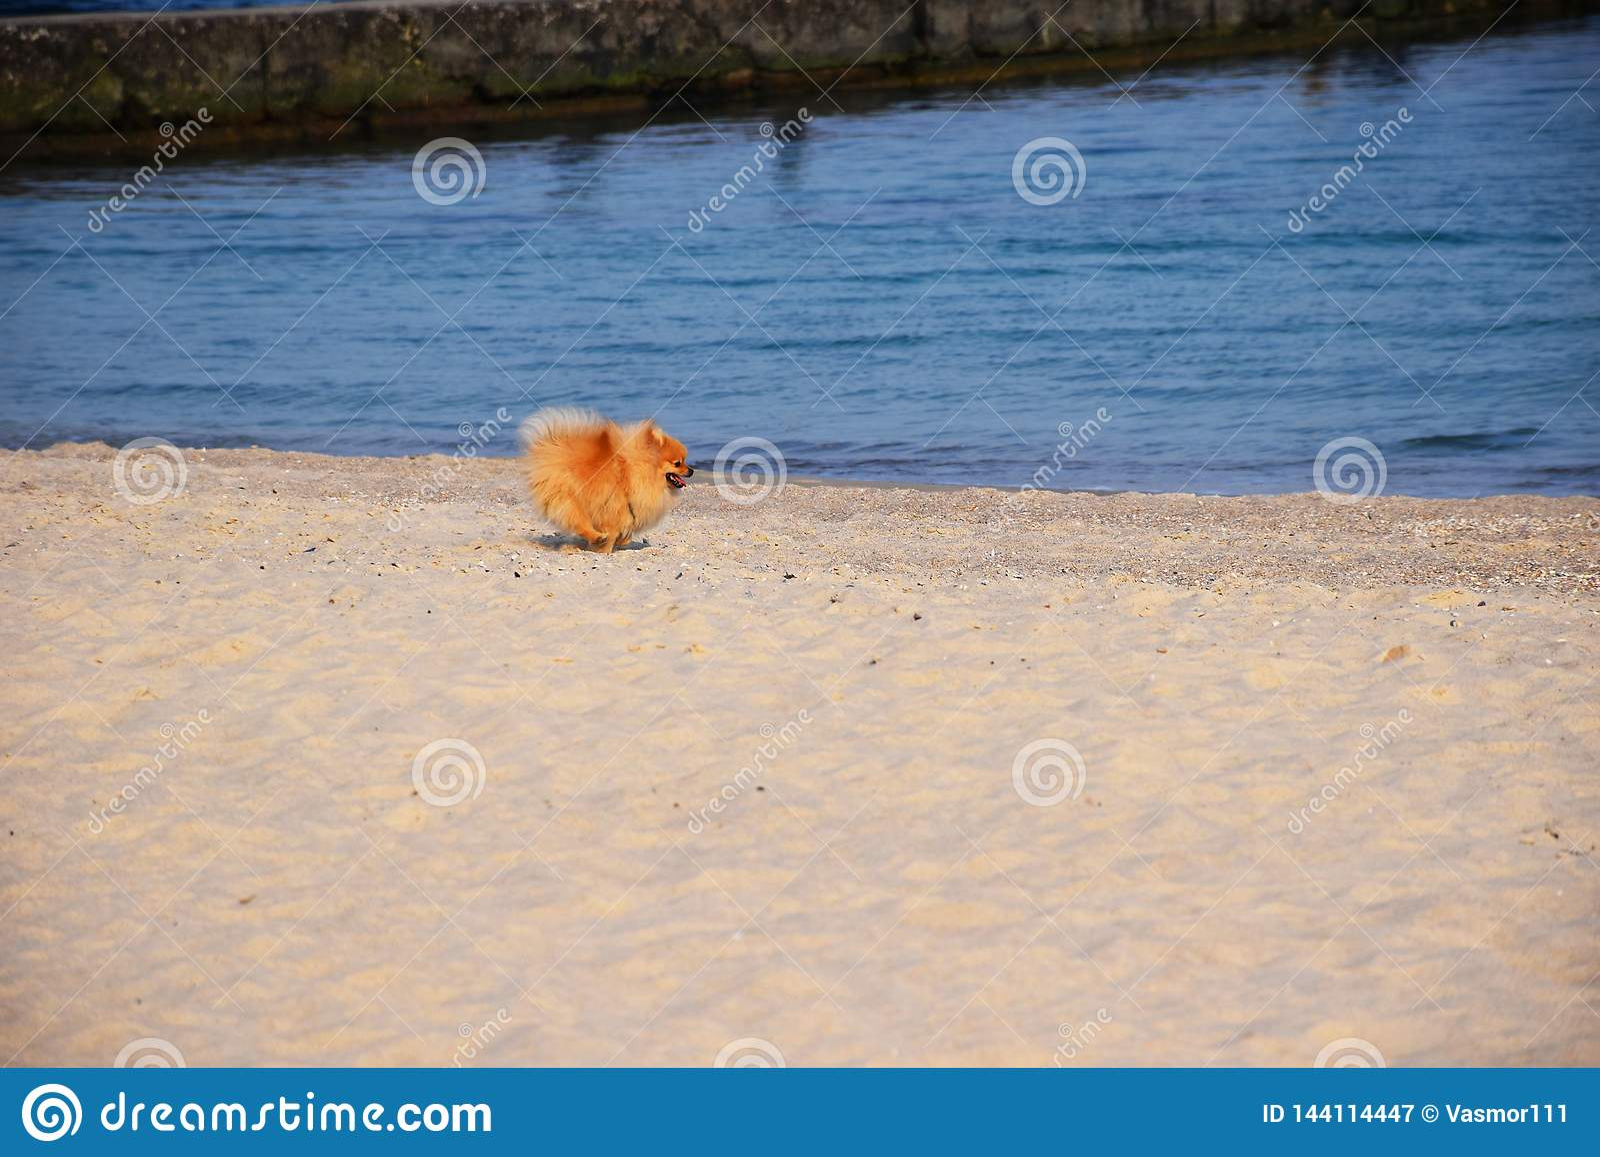 Pomeranianspitz weinig hond